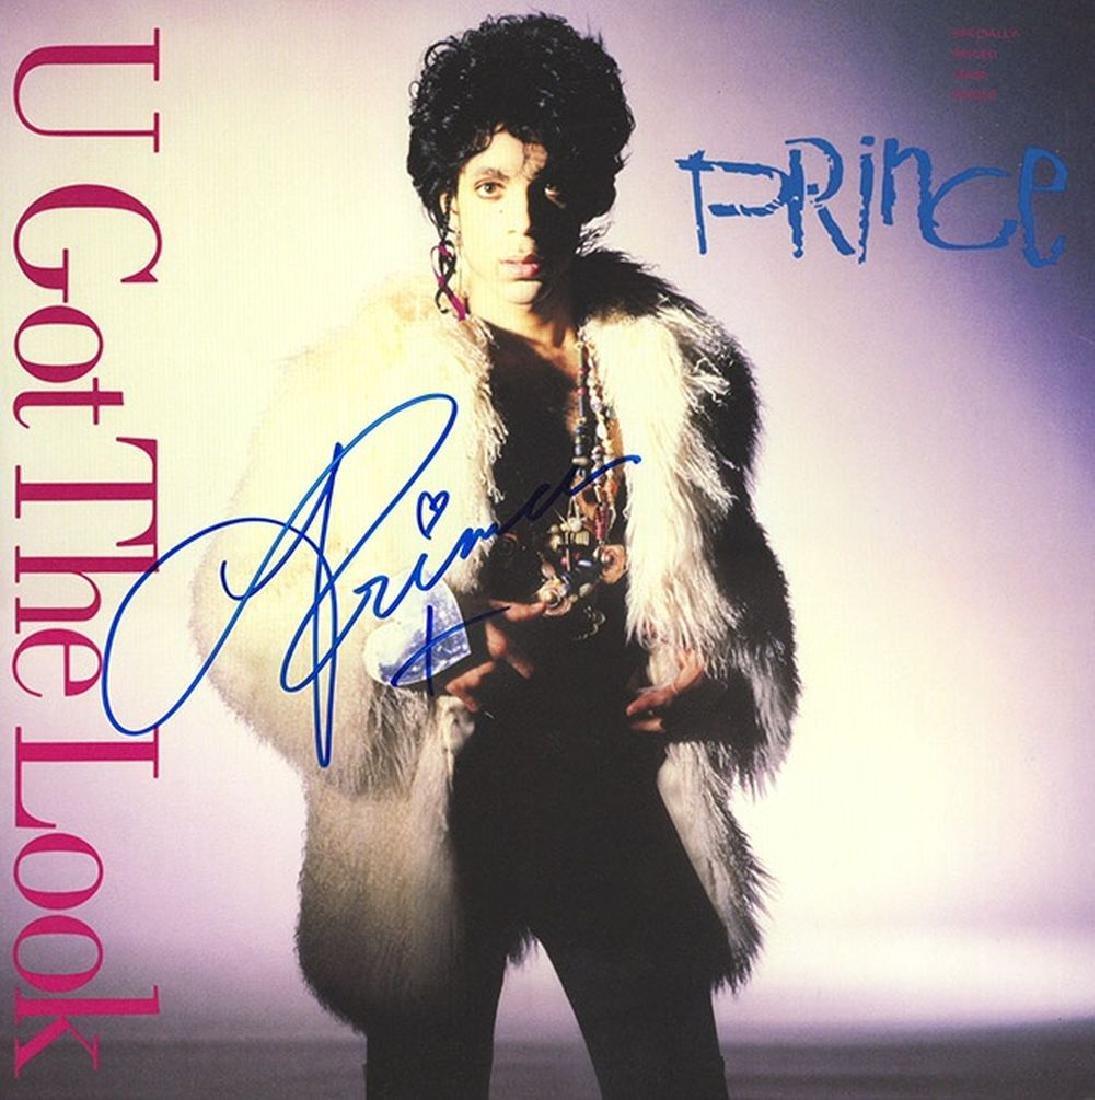 Prince Signed U Got the Look Album